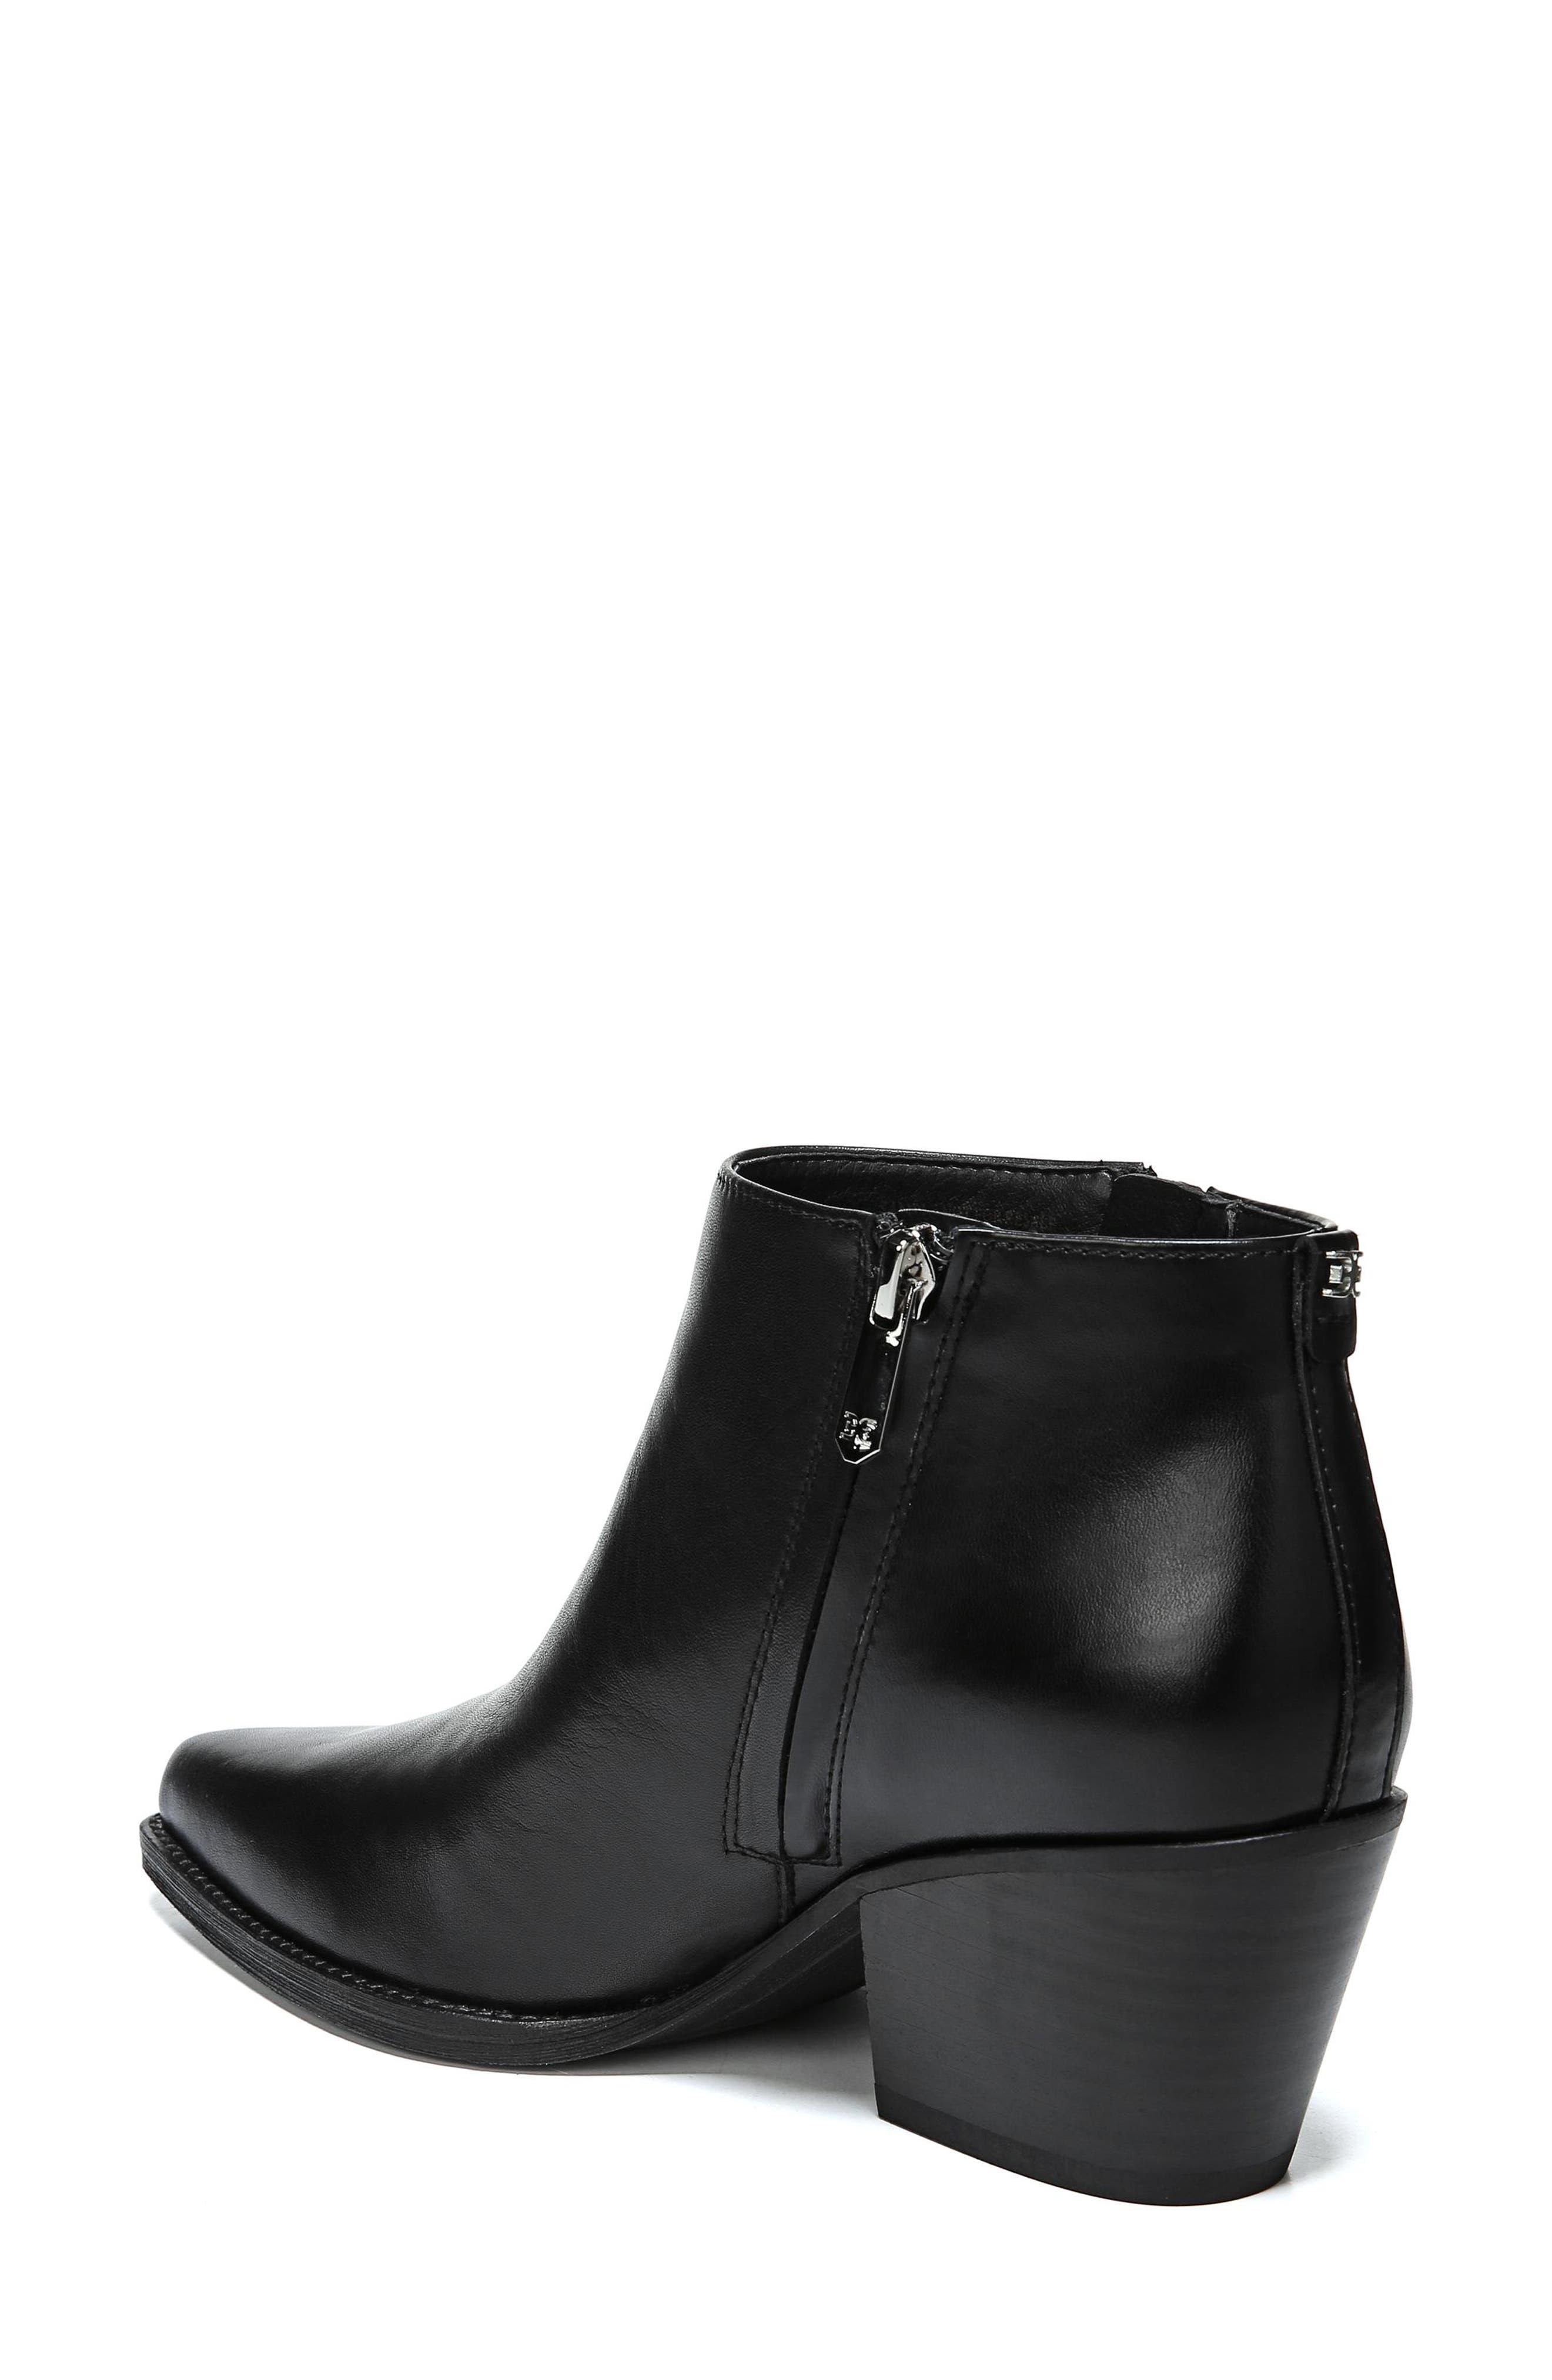 db1a8fce5222 Sam Edelman Boots